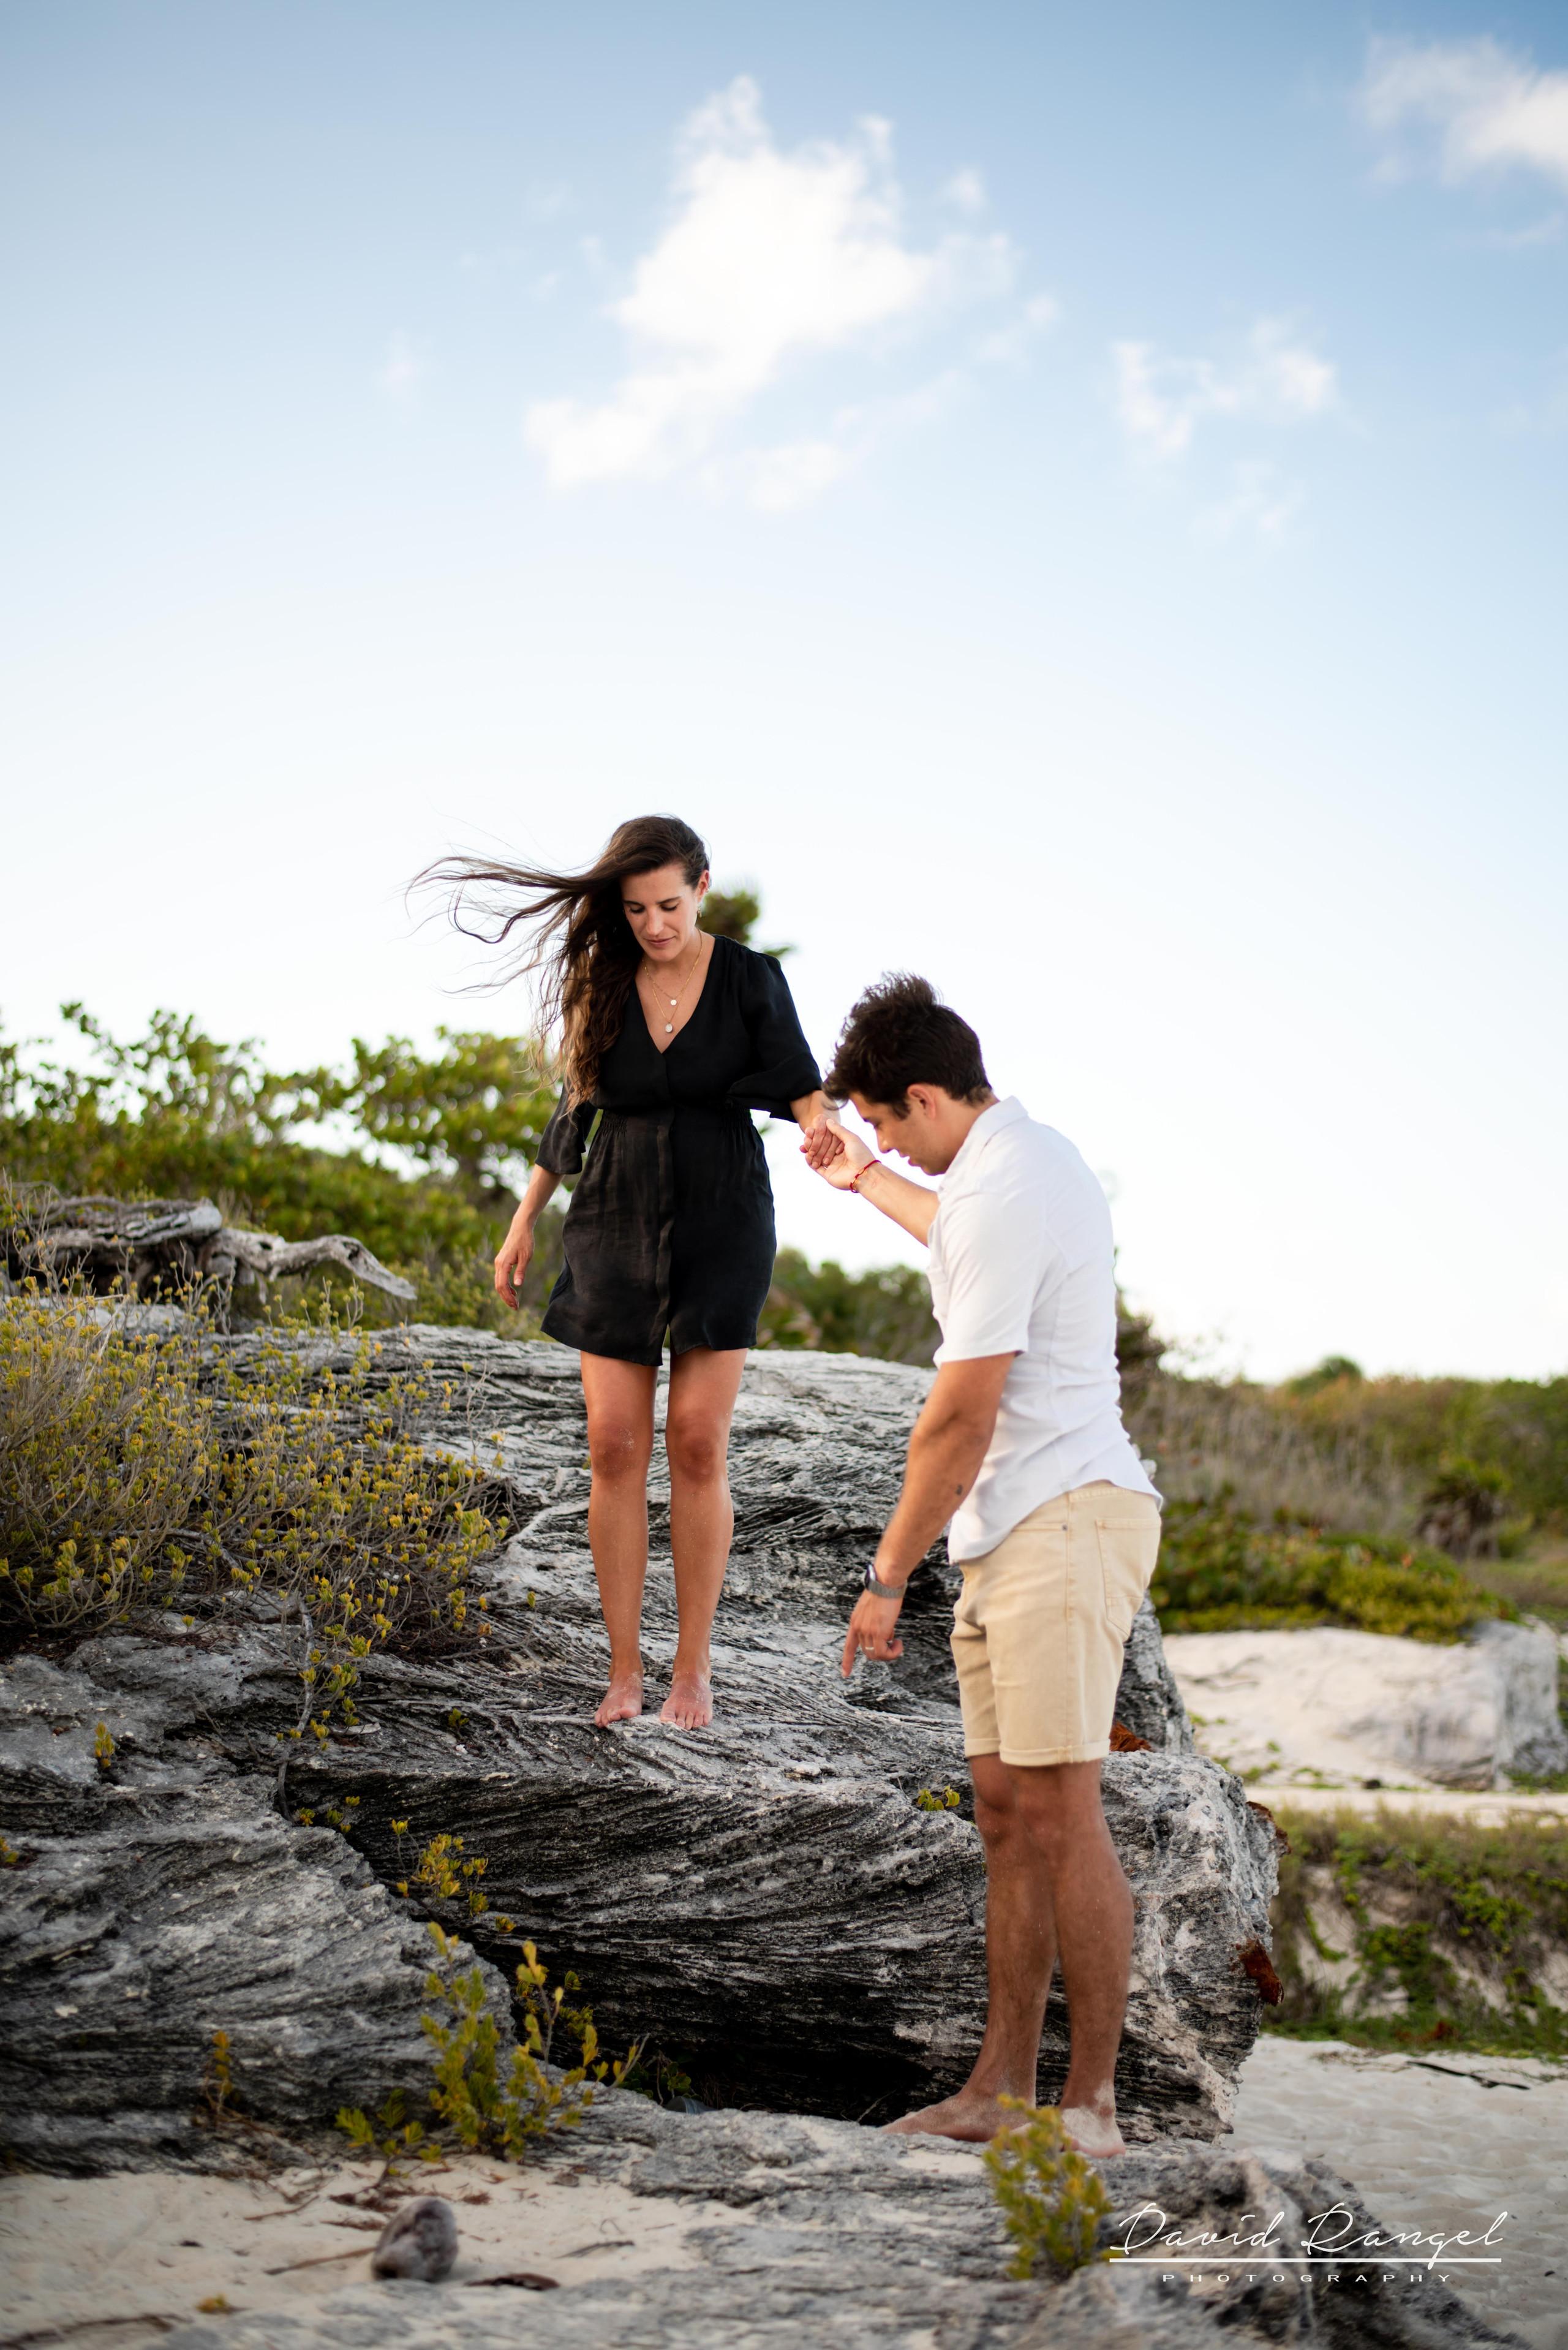 beach+session+riviera+maya+pregnancy+rocks+couple+future+mother+mom+love